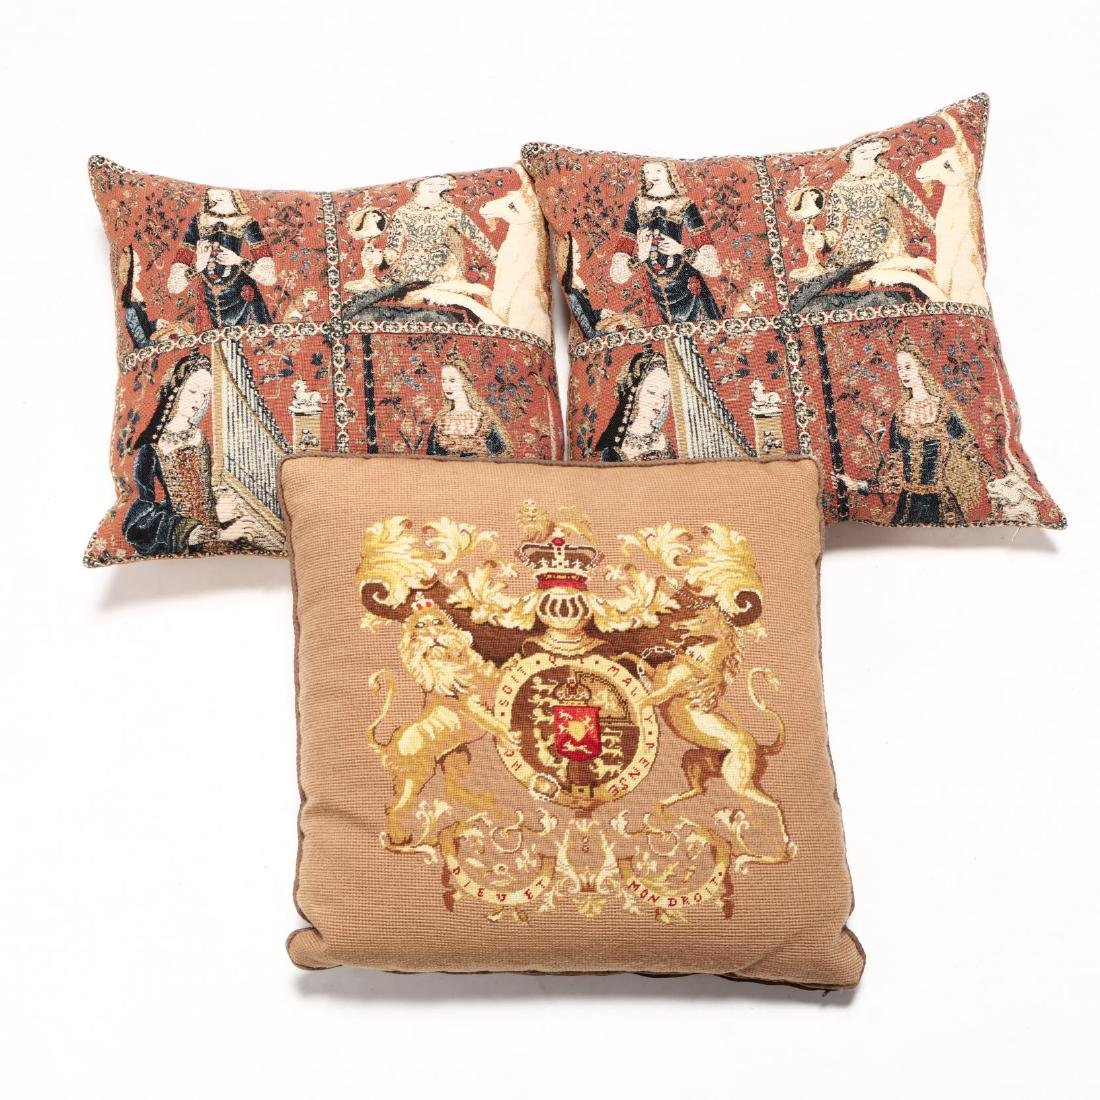 Three Elizabethan Style Pillows